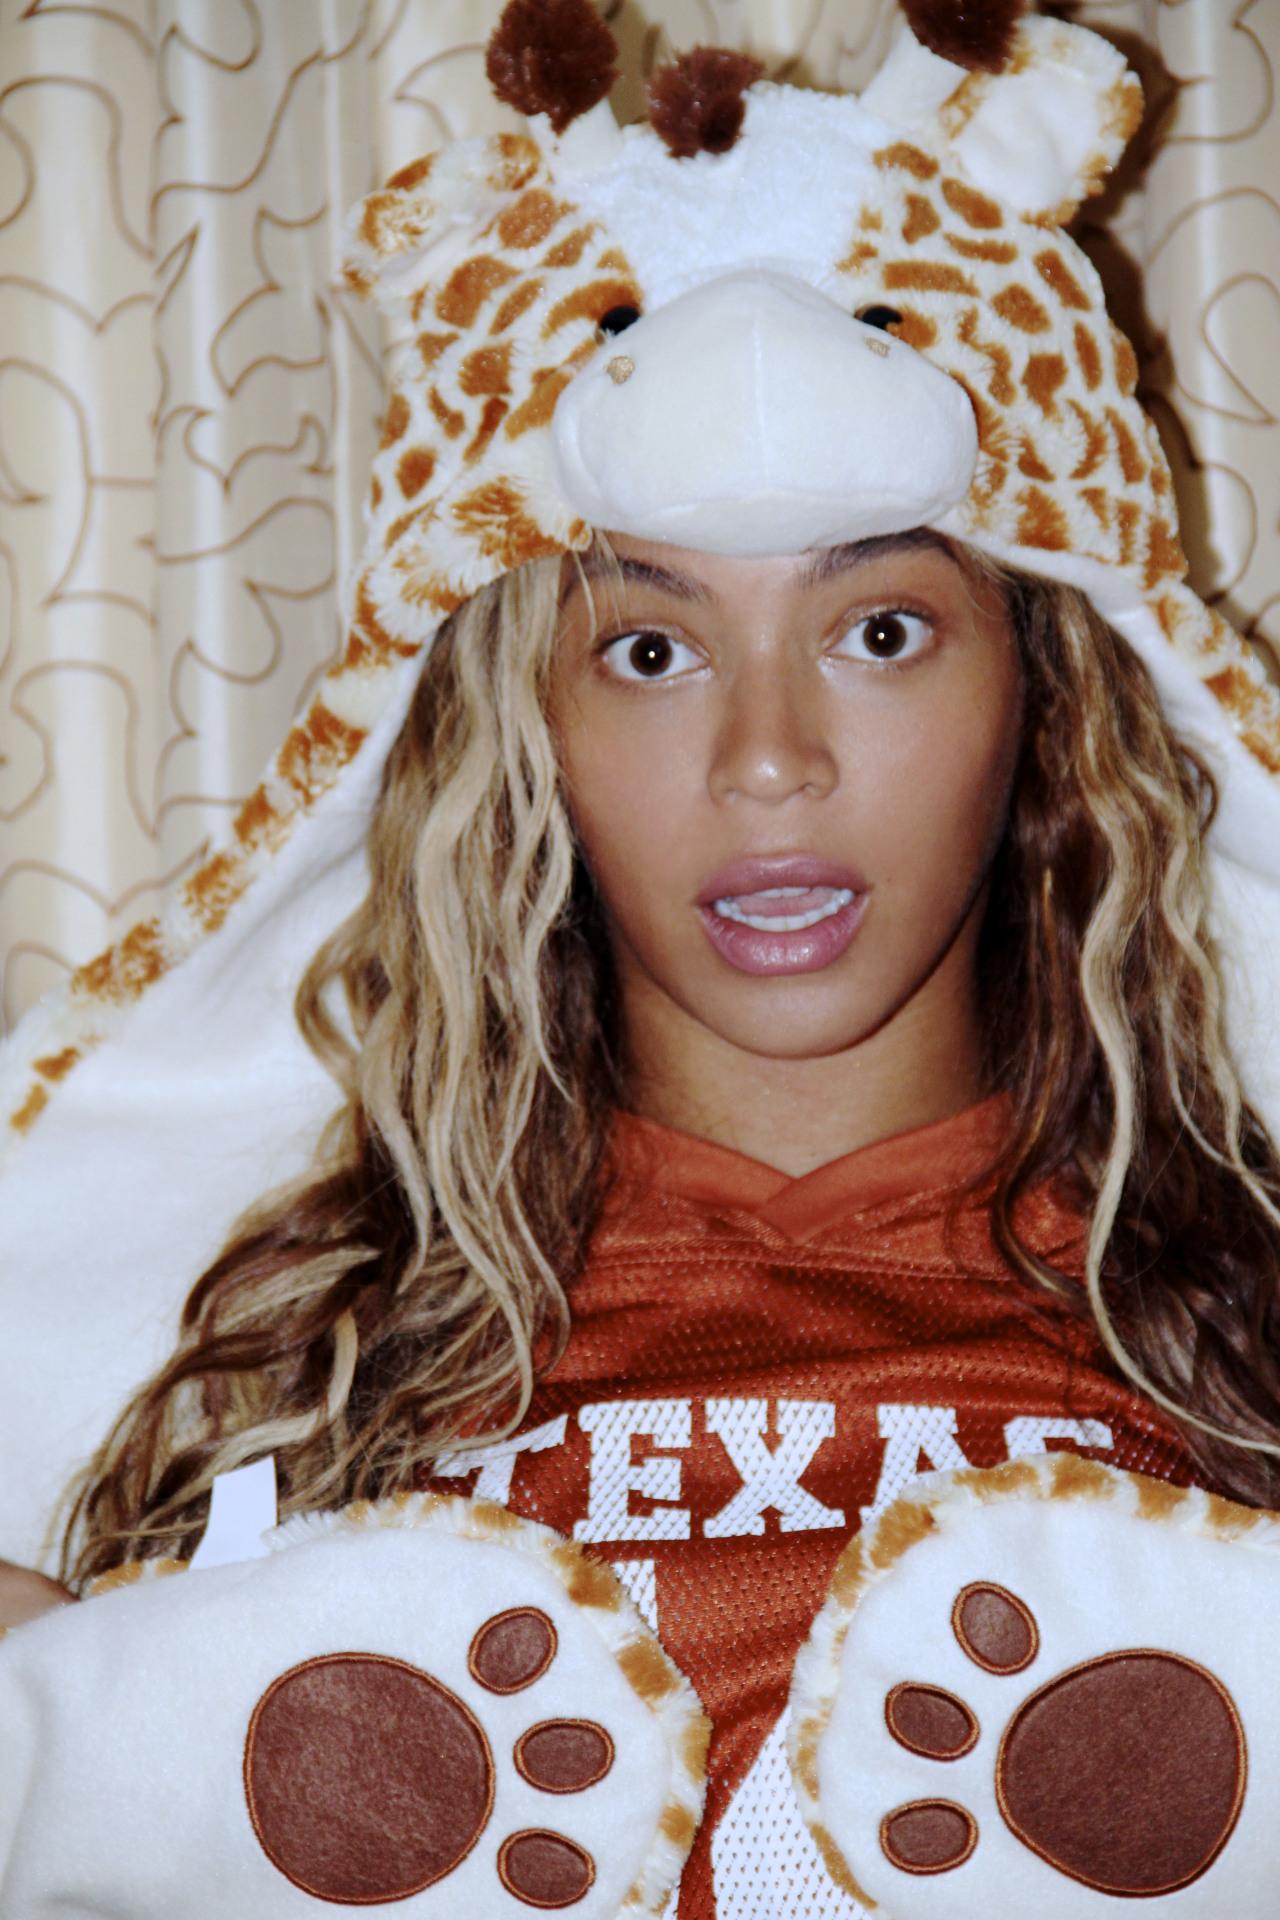 Beyoncé - Twitter (@Beyonce), Instagram (Baddiebey), Tumblr (I Am...) - Página 49 Tumblr_mxlqogakZn1rqgjz2o1_1280